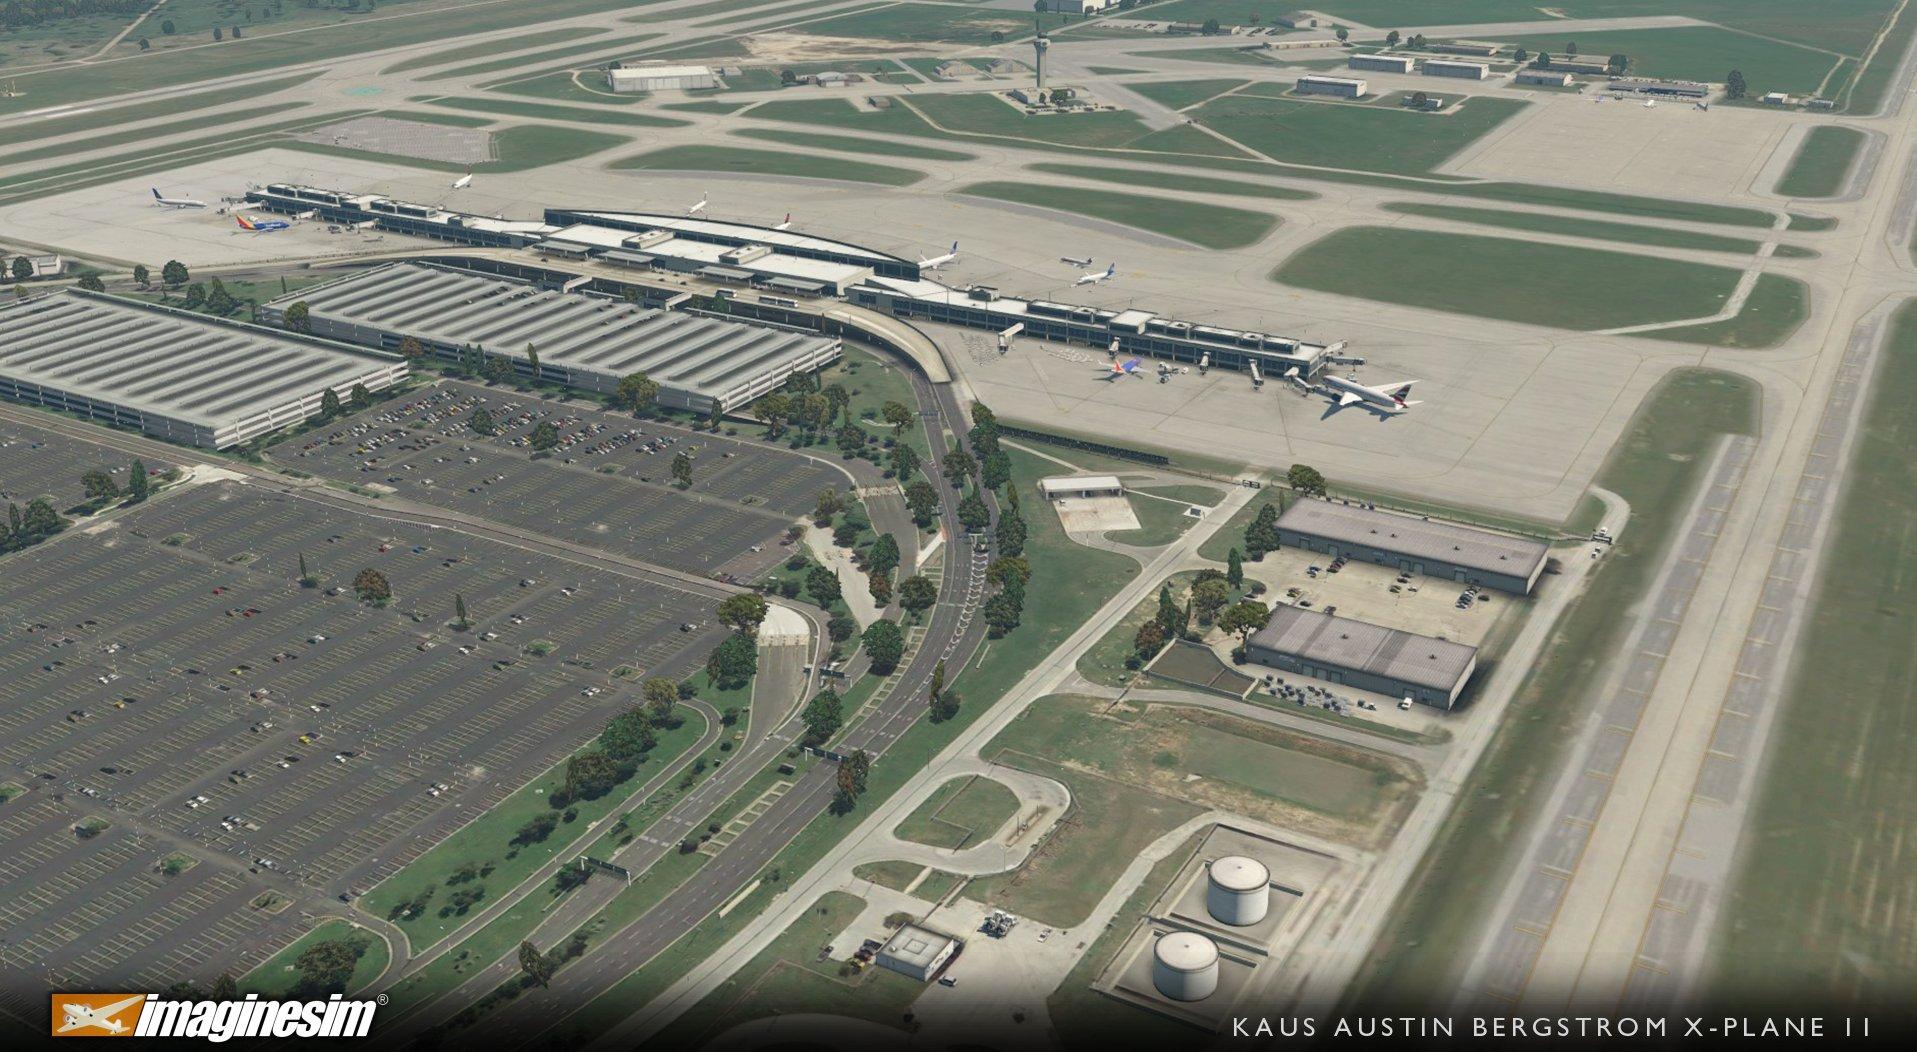 ImagineSim Release Austin (KAUS) for X-Plane 11 | Threshold